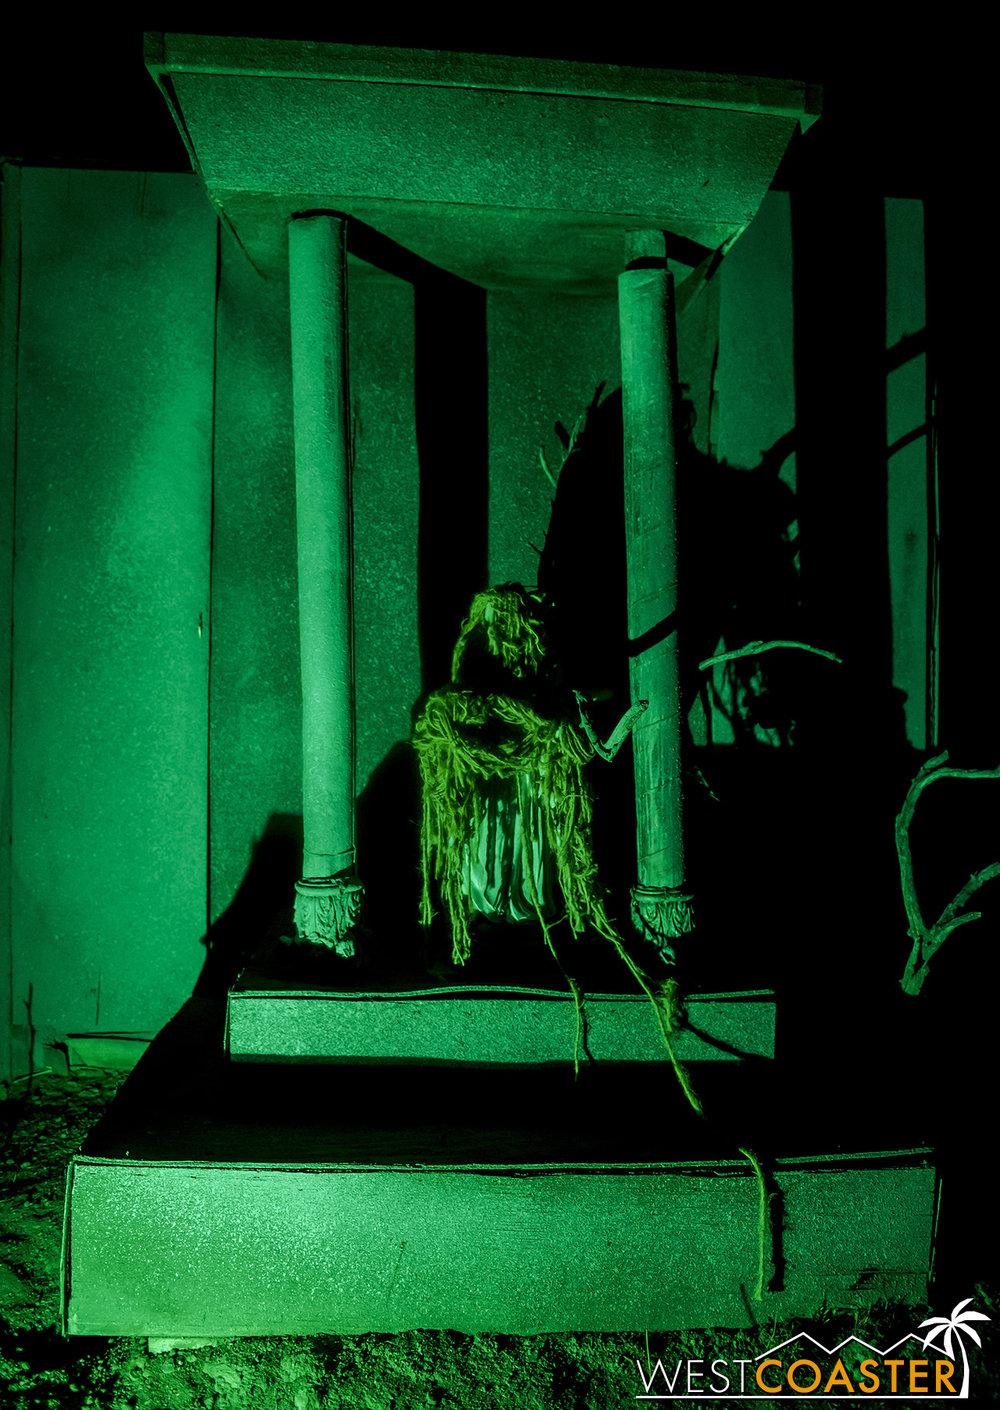 CoffinCreek-18_1014-A-Catacombs-0001.jpg